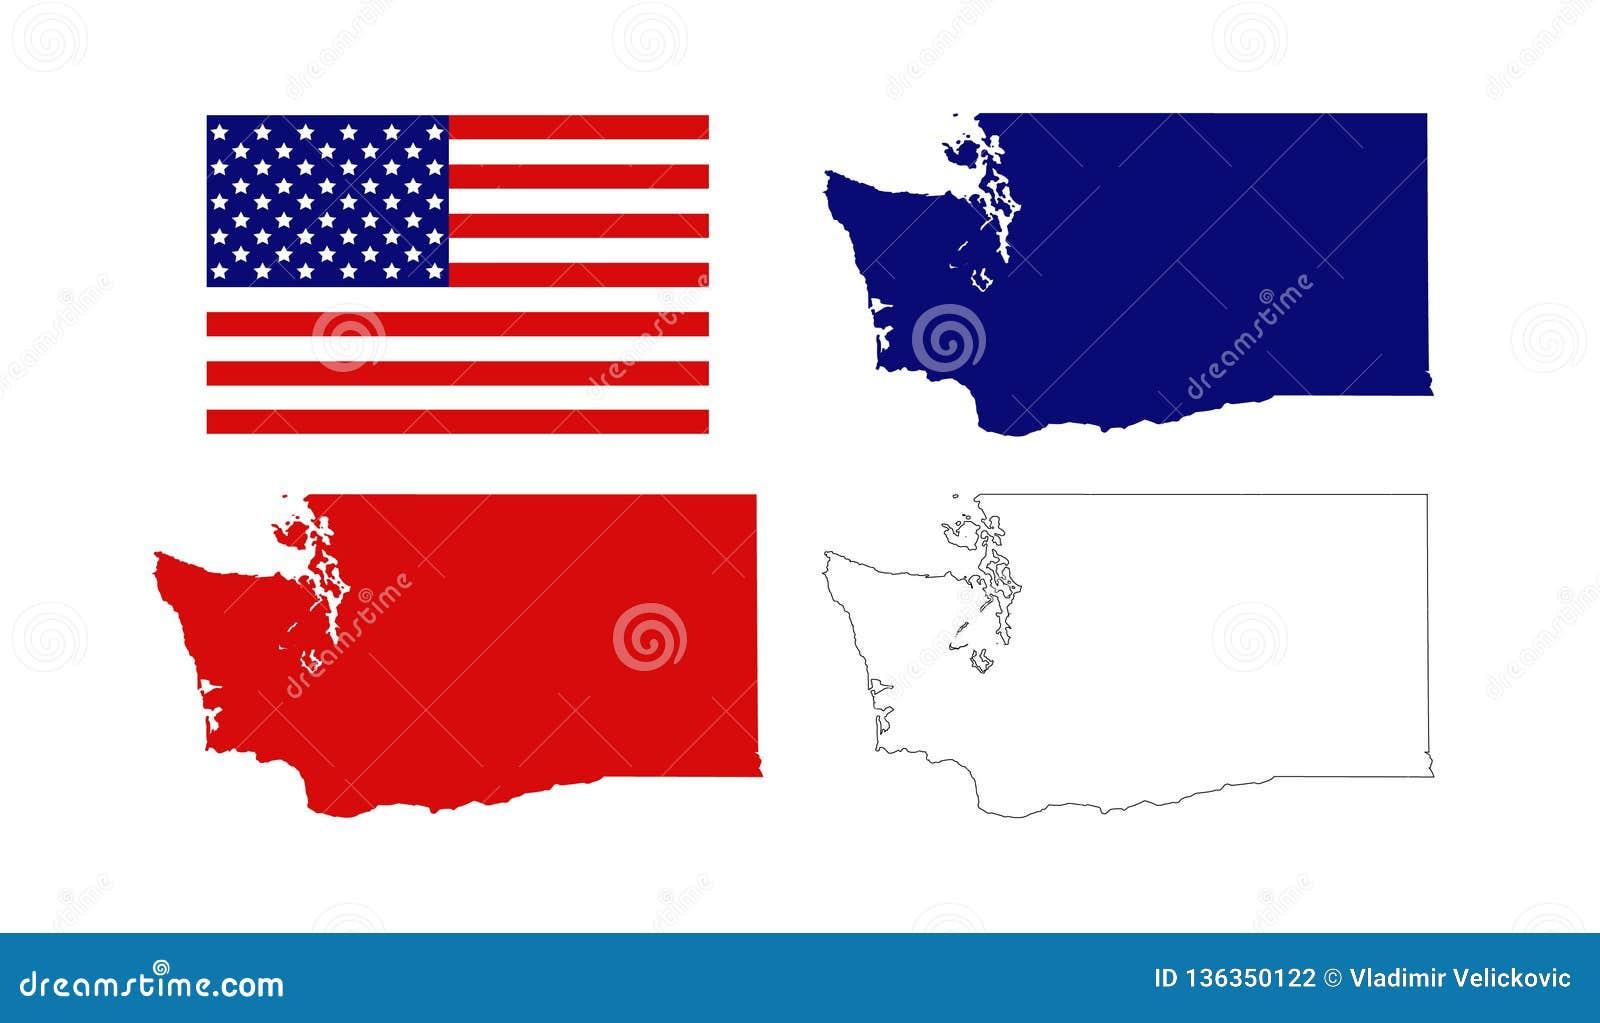 Washington State Maps With USA Flag - State Of Washington ...